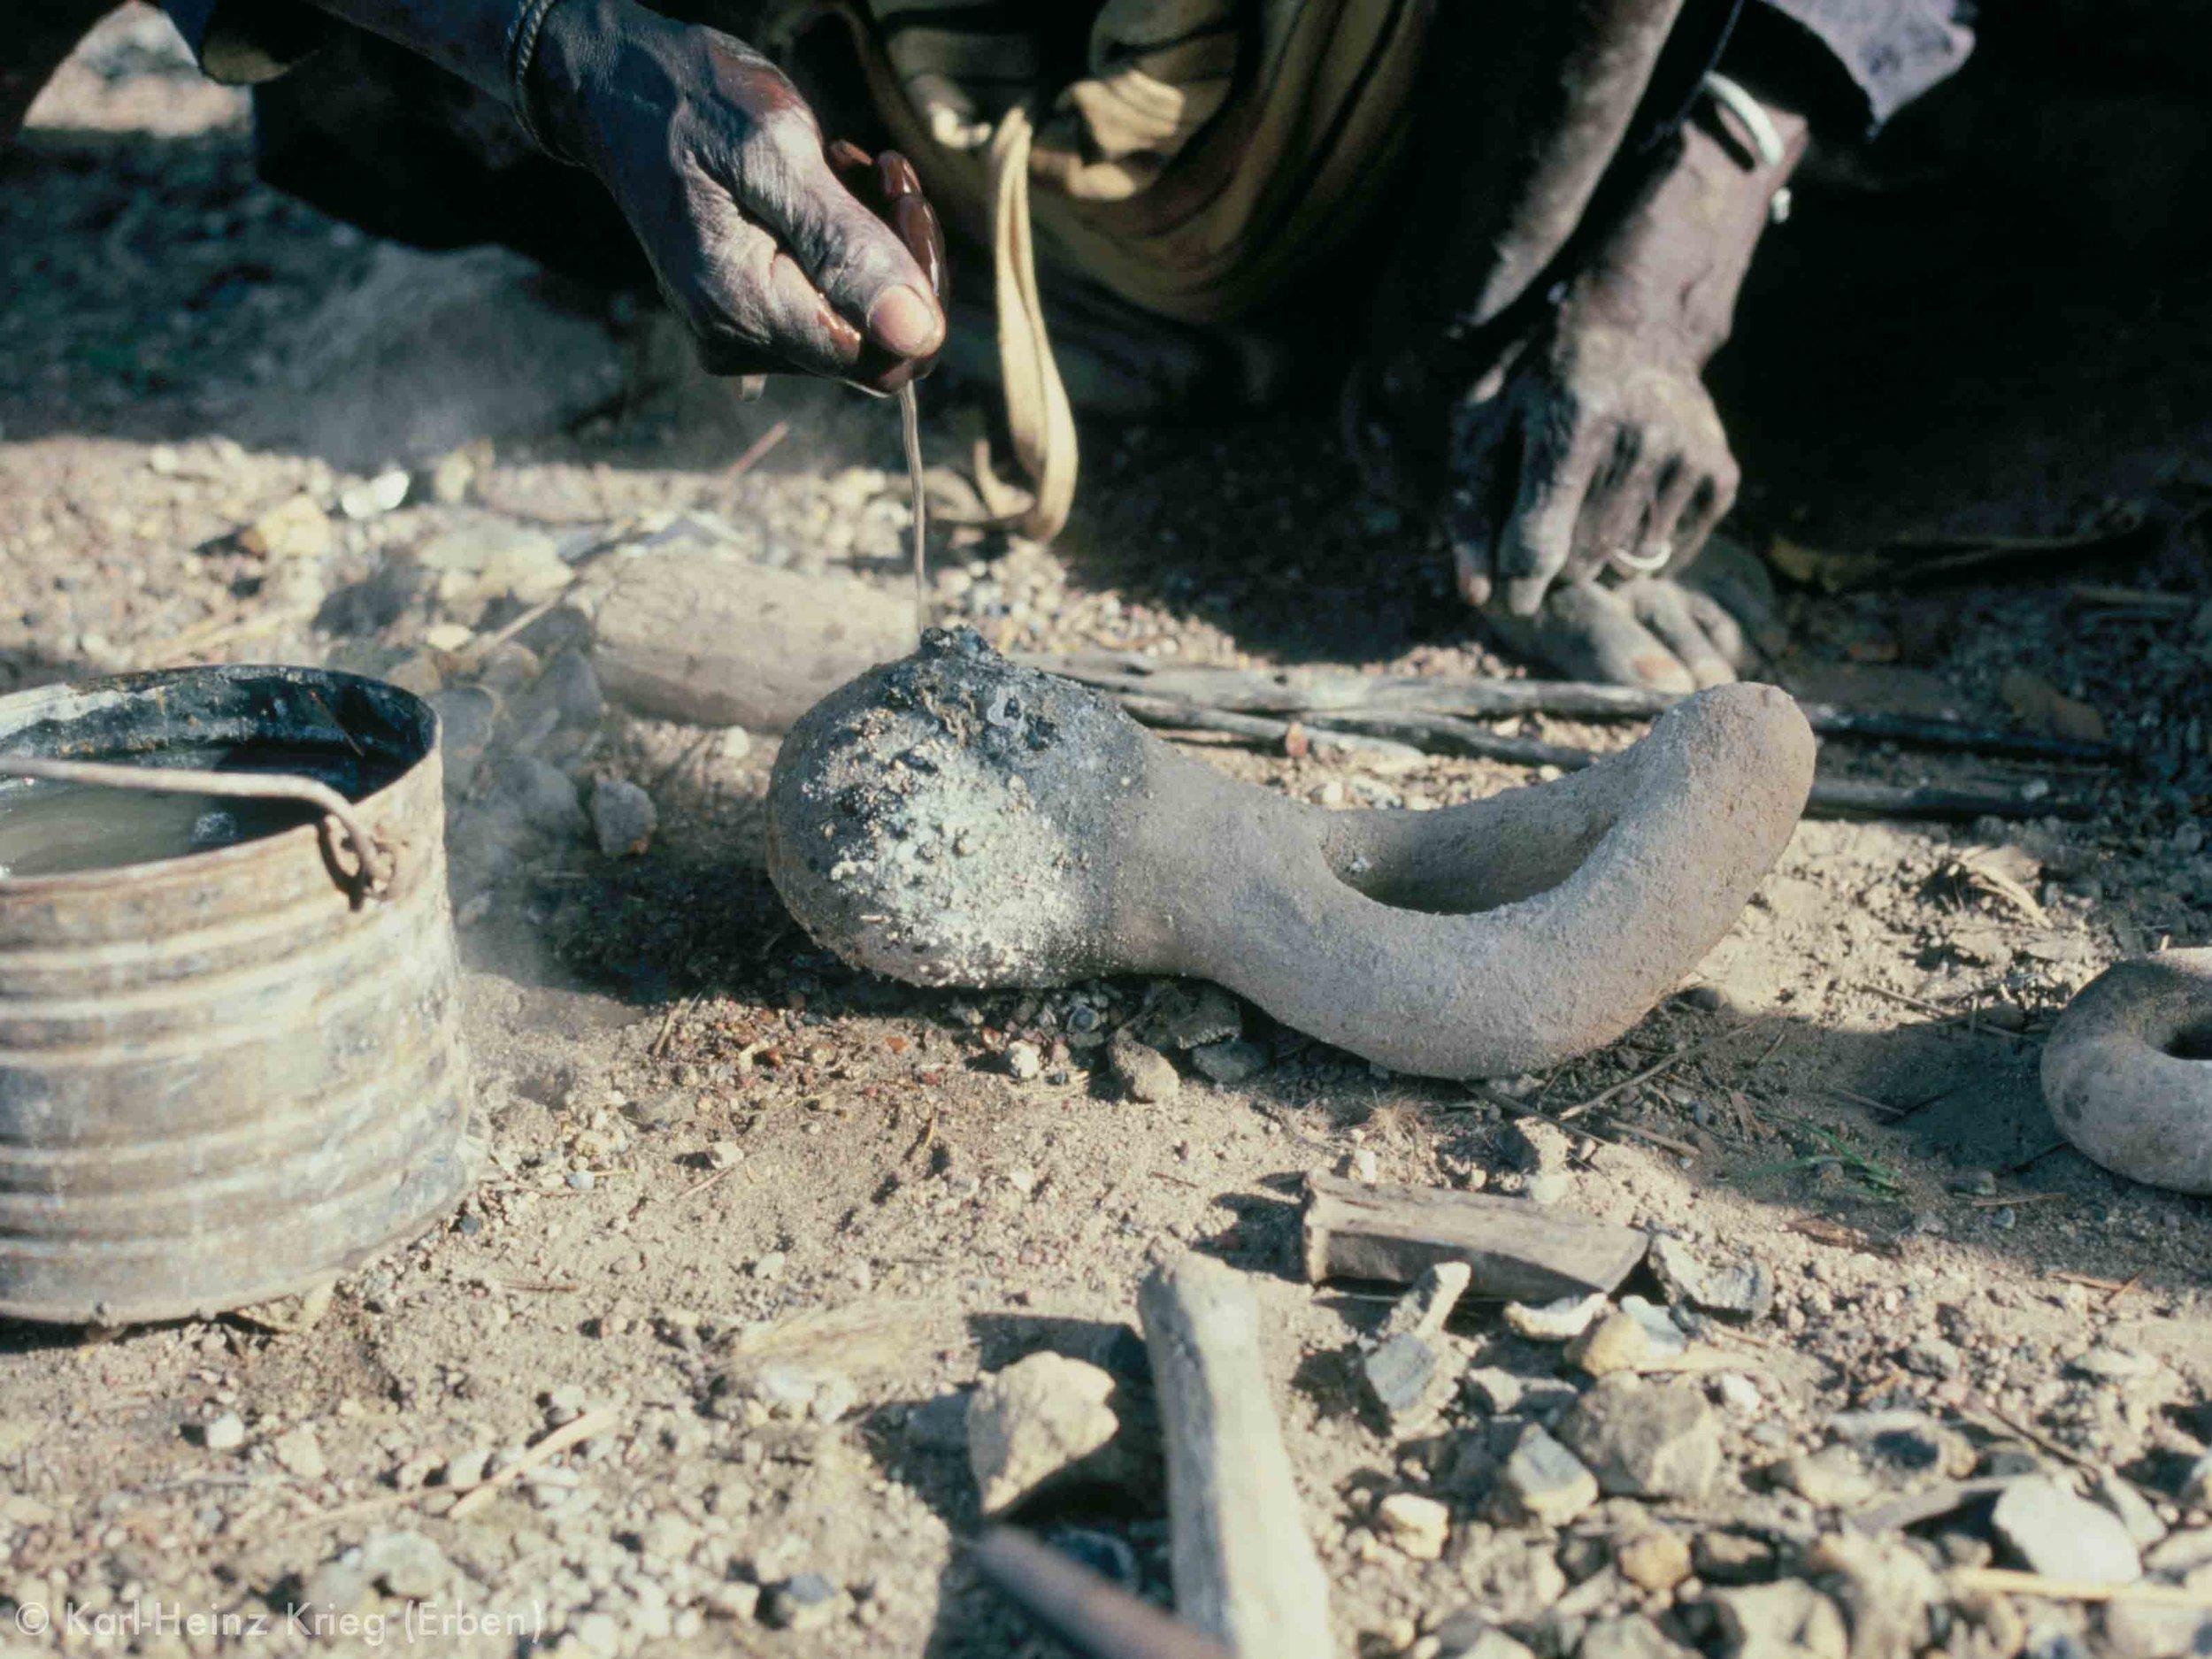 Clay mold after casting bracelet. Photo: Karl-Heinz Krieg, Nafoun (Region of Boundiali, Côte d'Ivoire), 1978